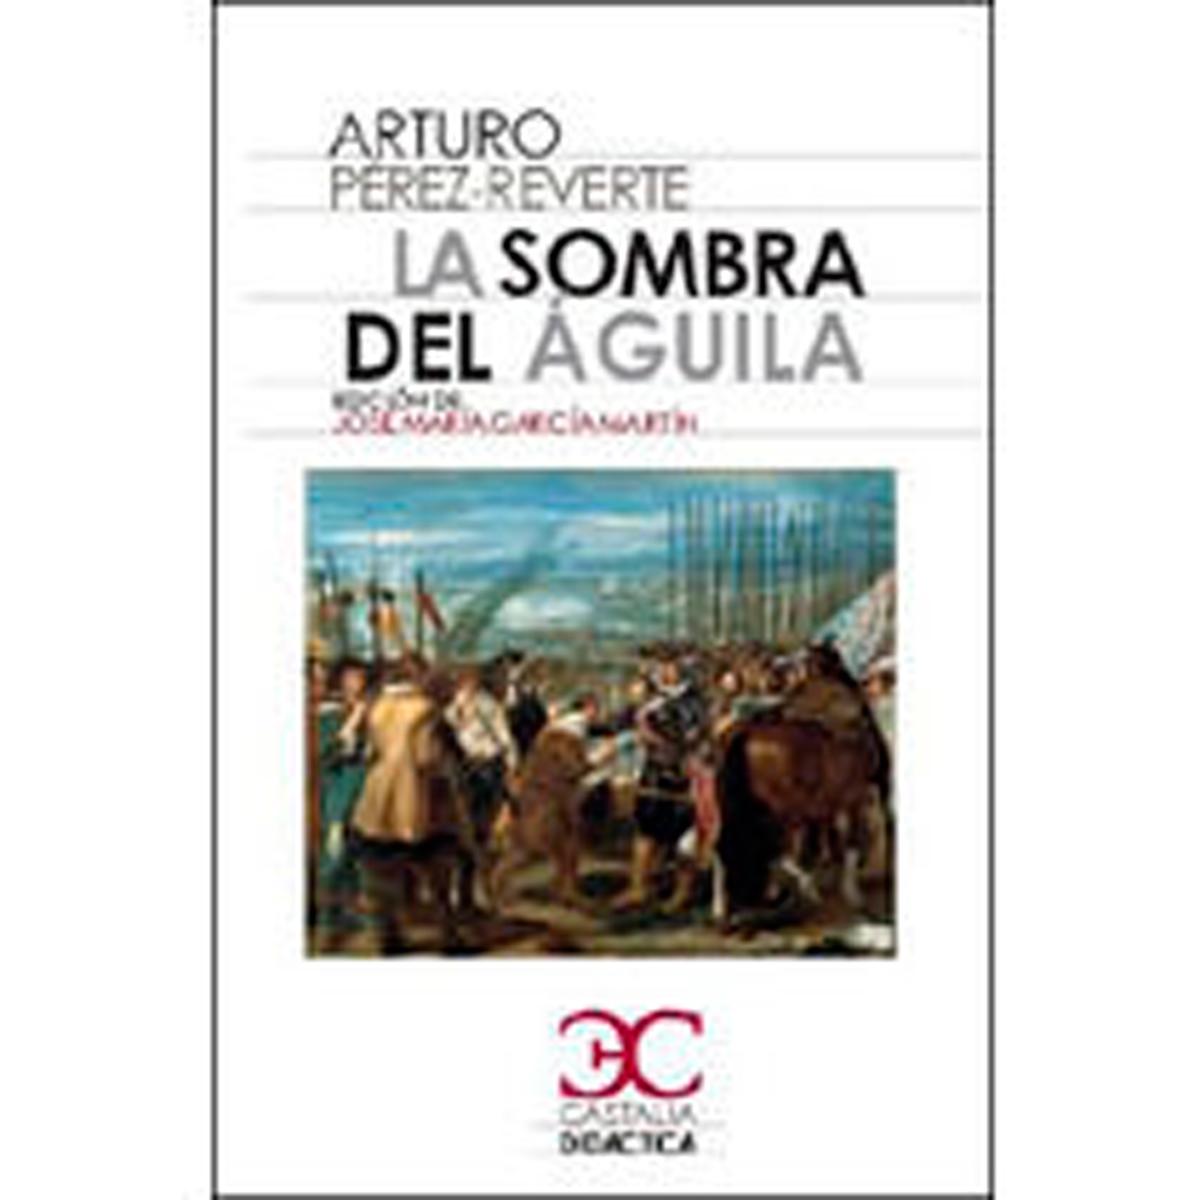 La sombra del águila - Pérez-Reverte Arturo